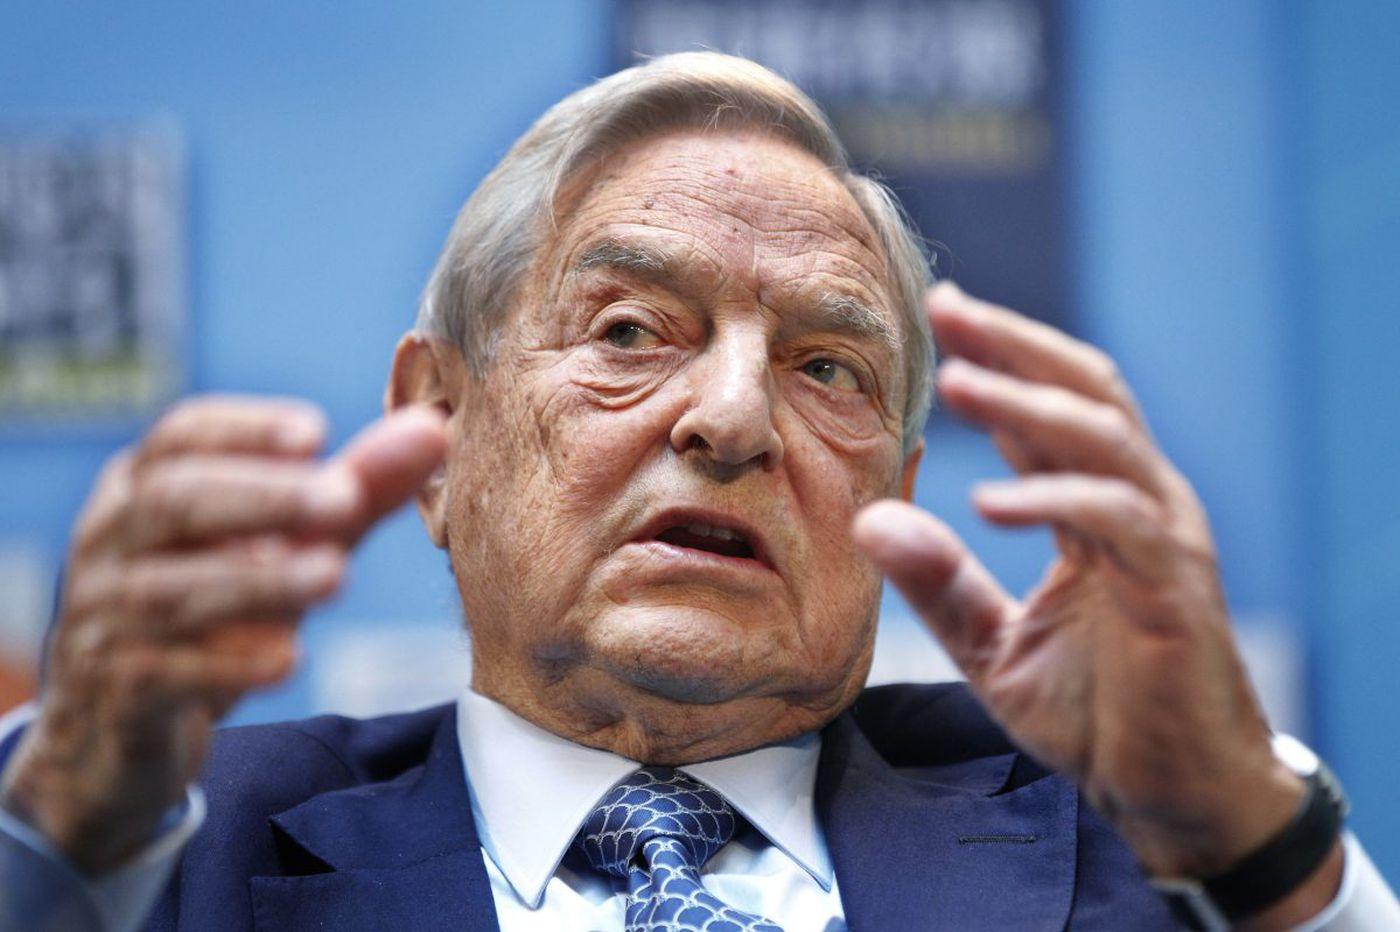 Soros cash affects DA races nationwide